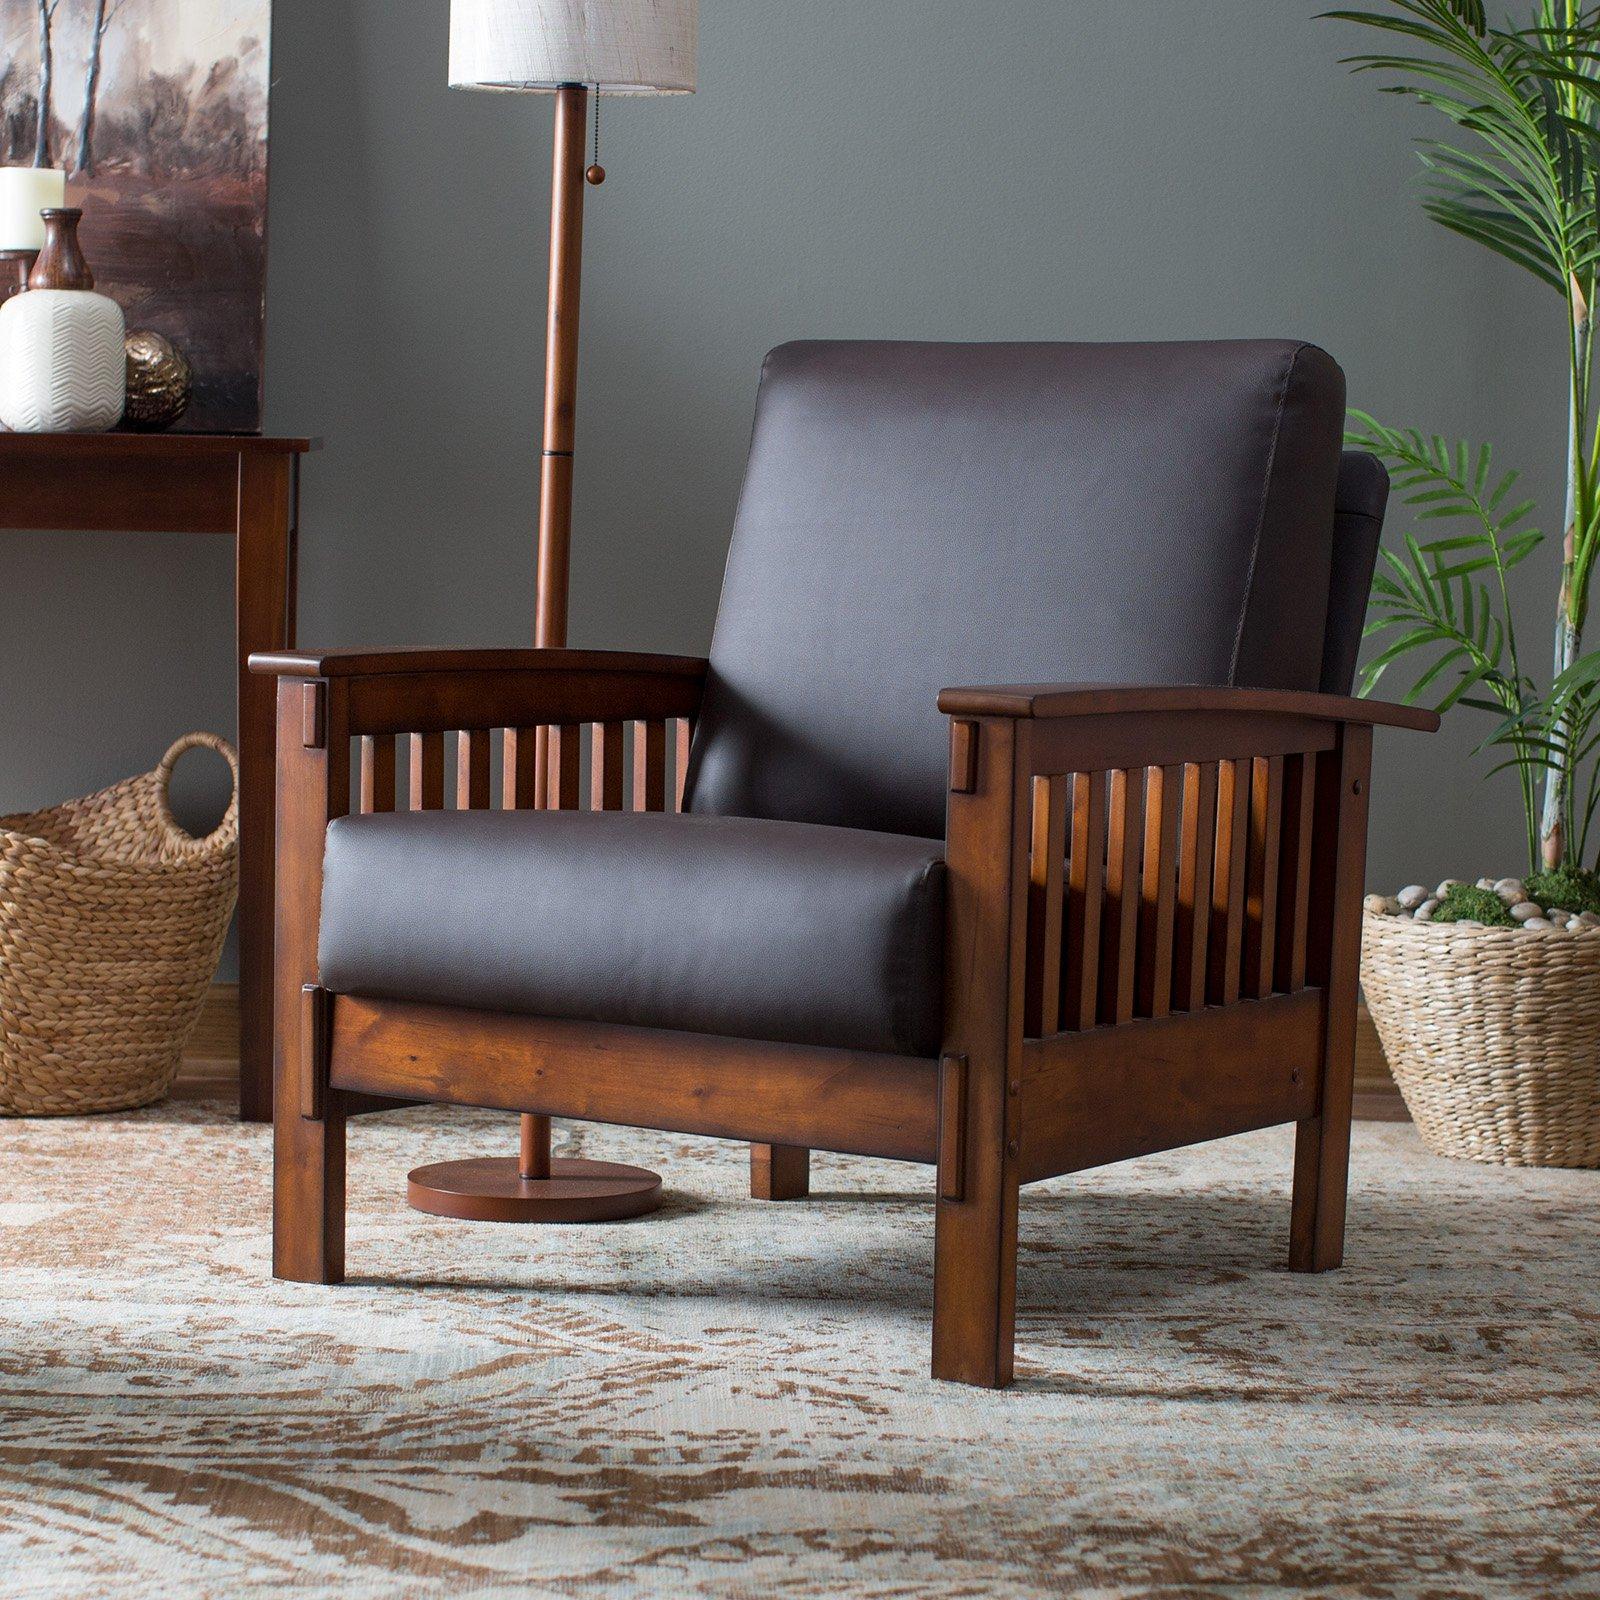 Belham Living Burton Mission Arm Chair Craftsman chairs